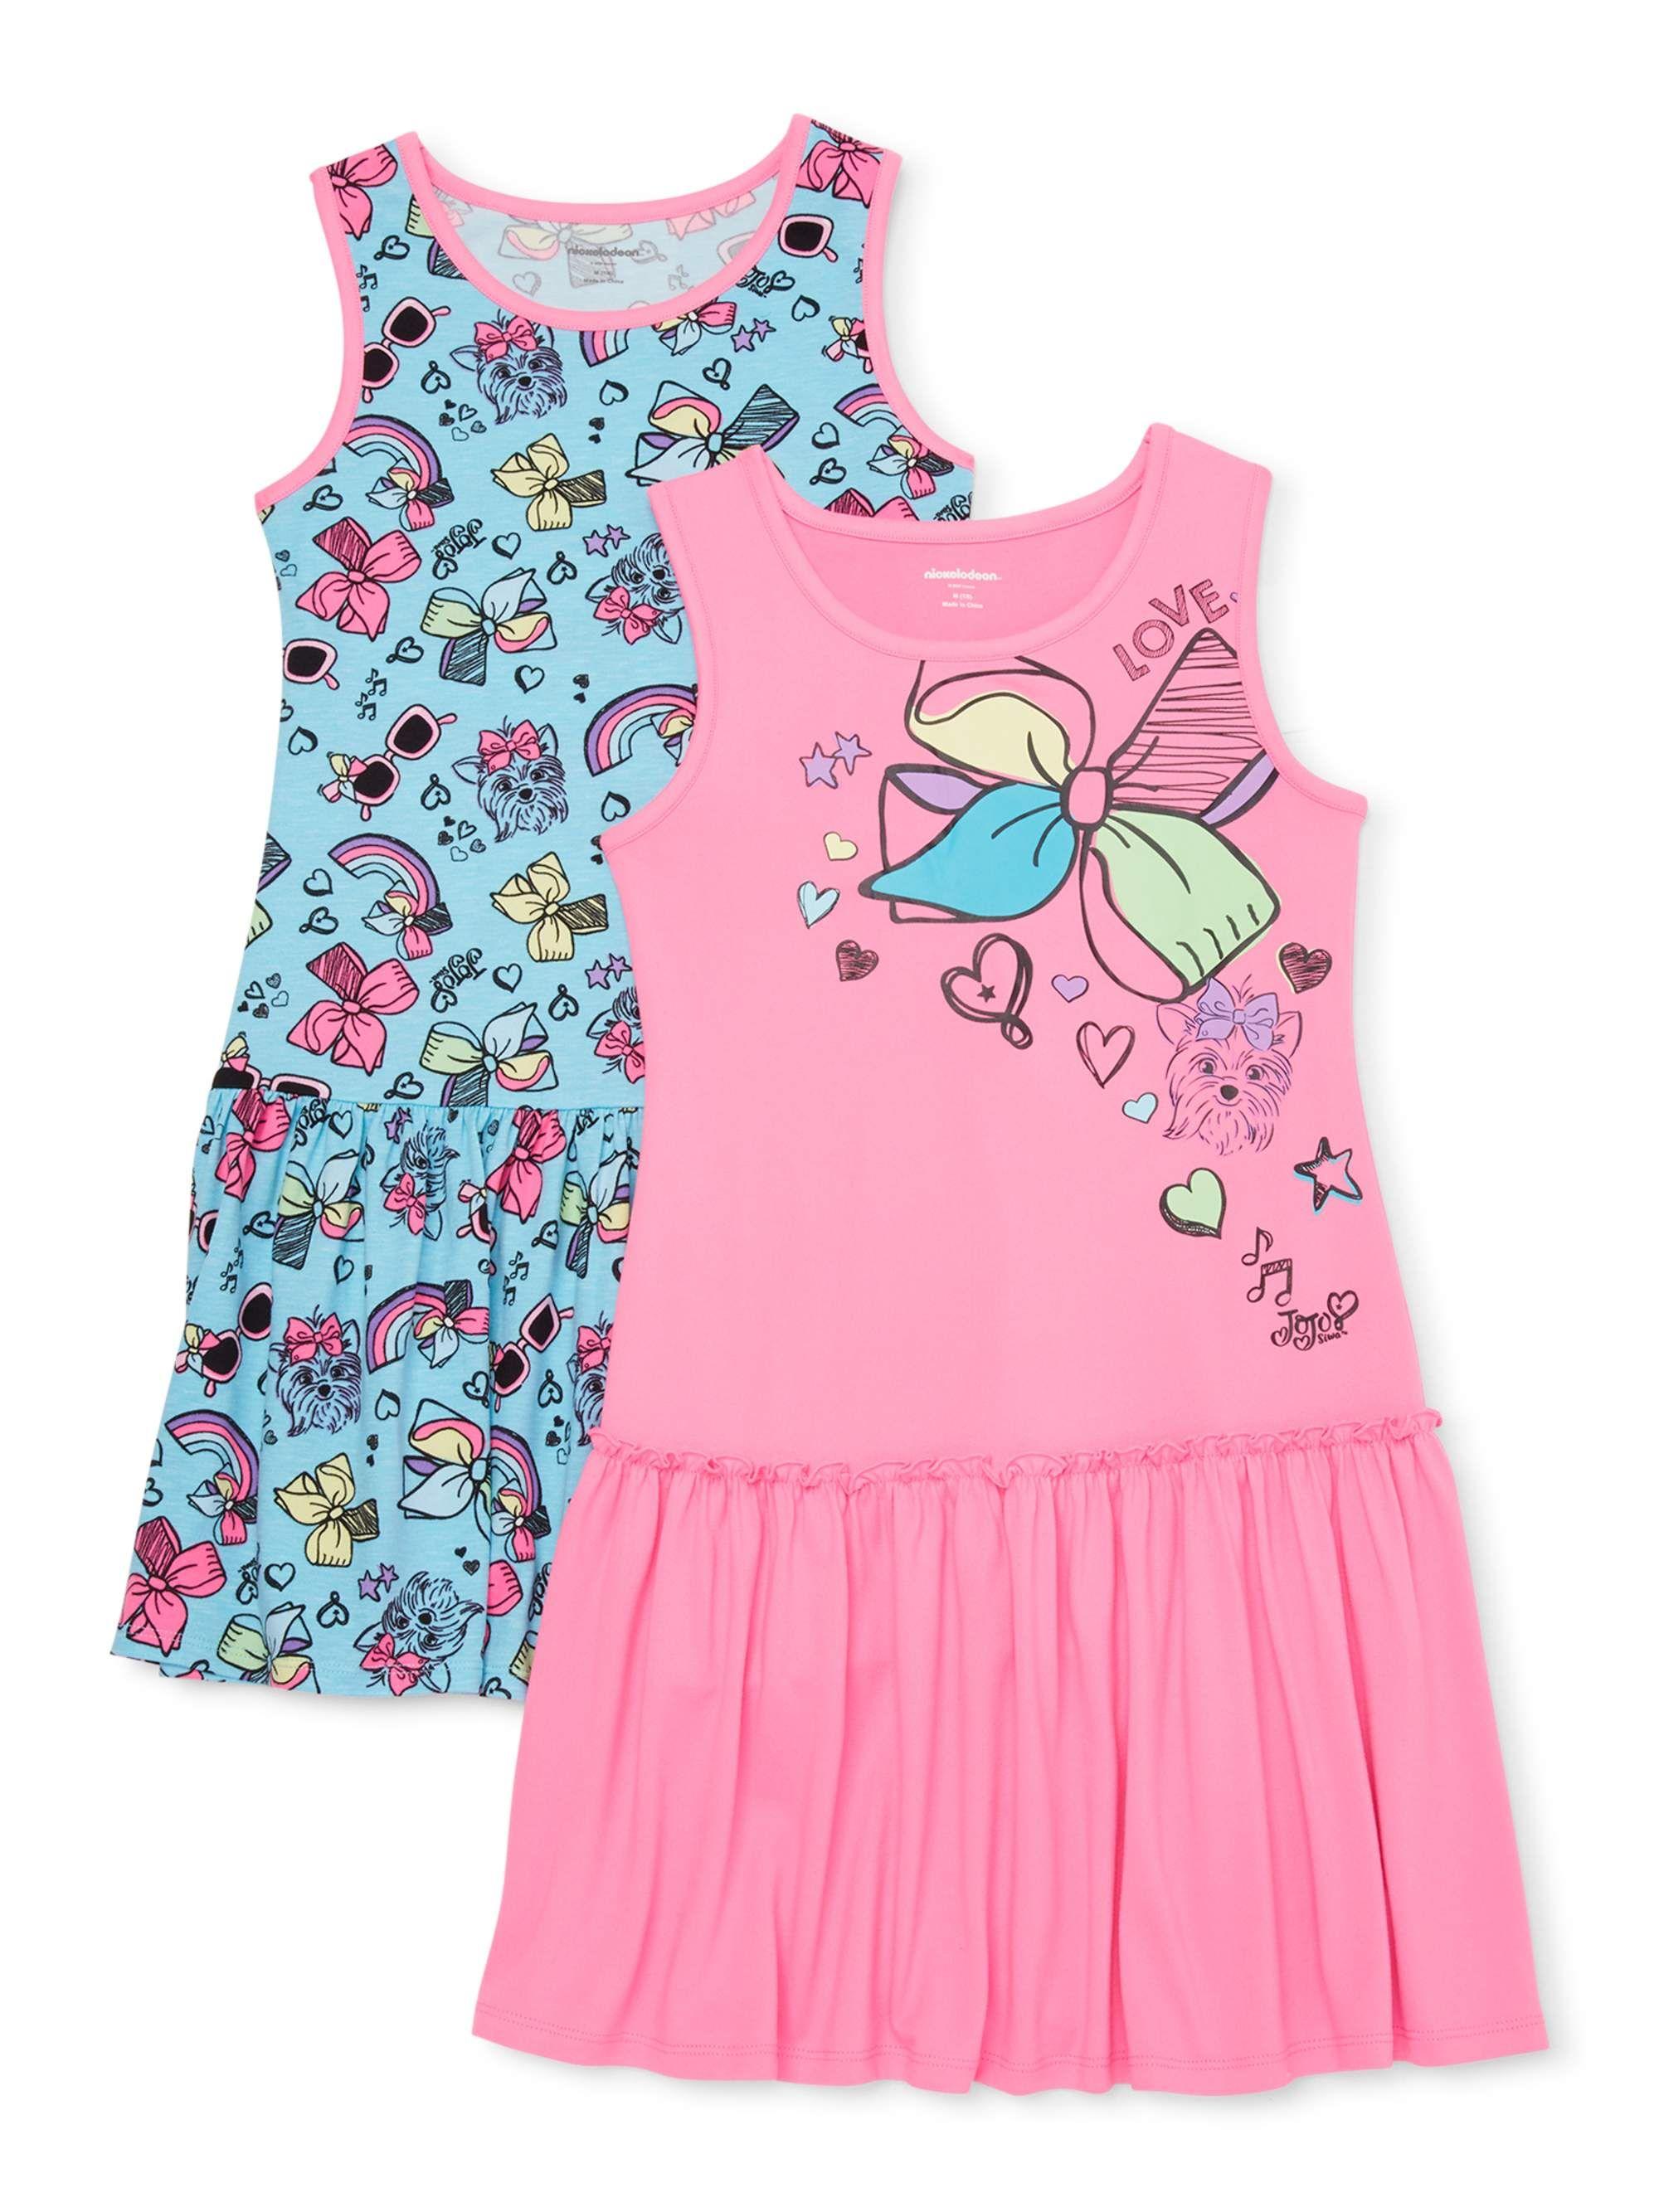 Pin By Kristin Johnson On Nina Little Girl Summer Dresses Jojo Siwa Outfits Dropwaist Dress [ 2667 x 2000 Pixel ]